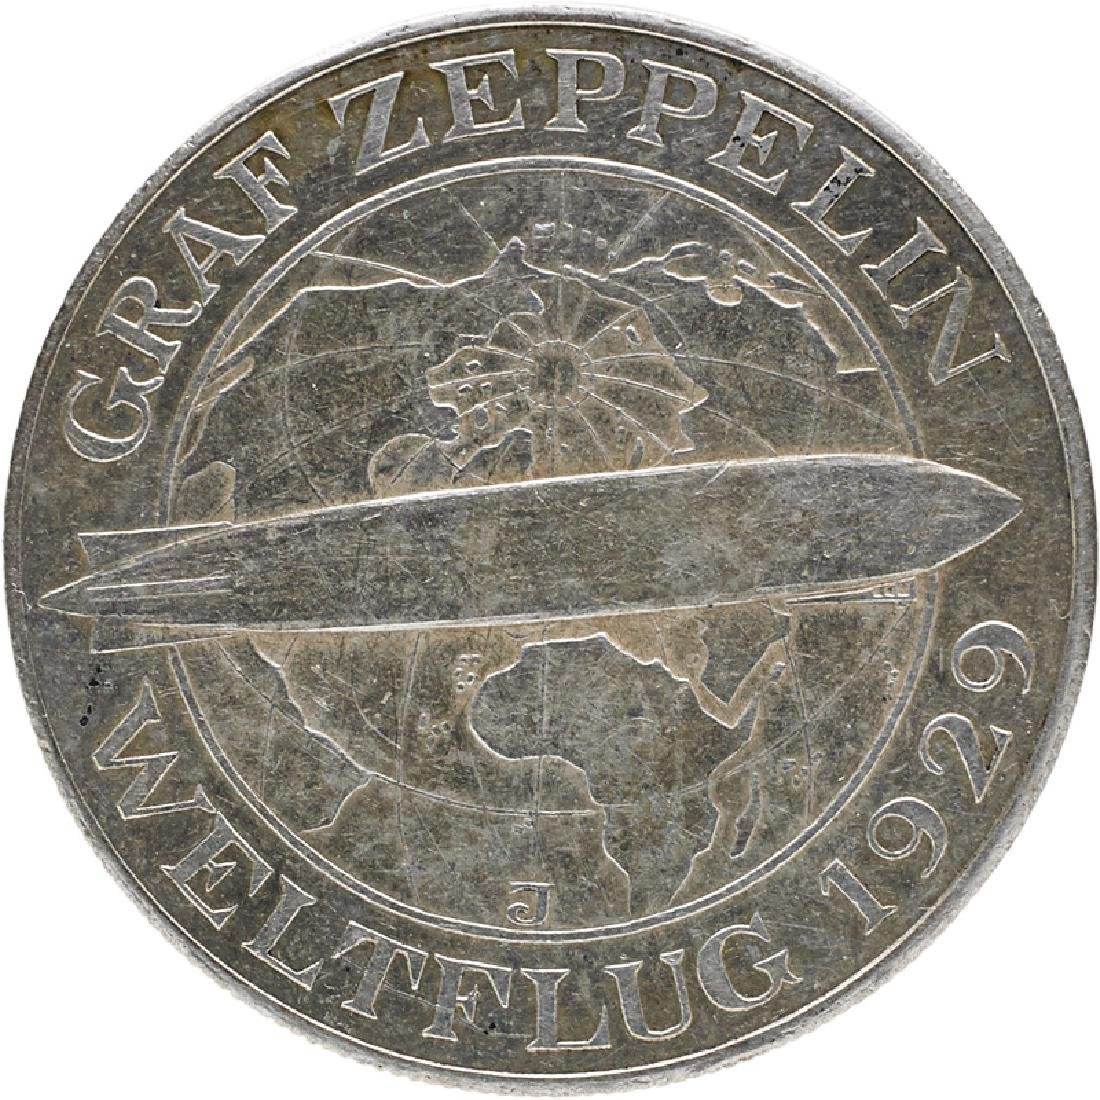 GERMAN GRAF ZEPPELIN COINS